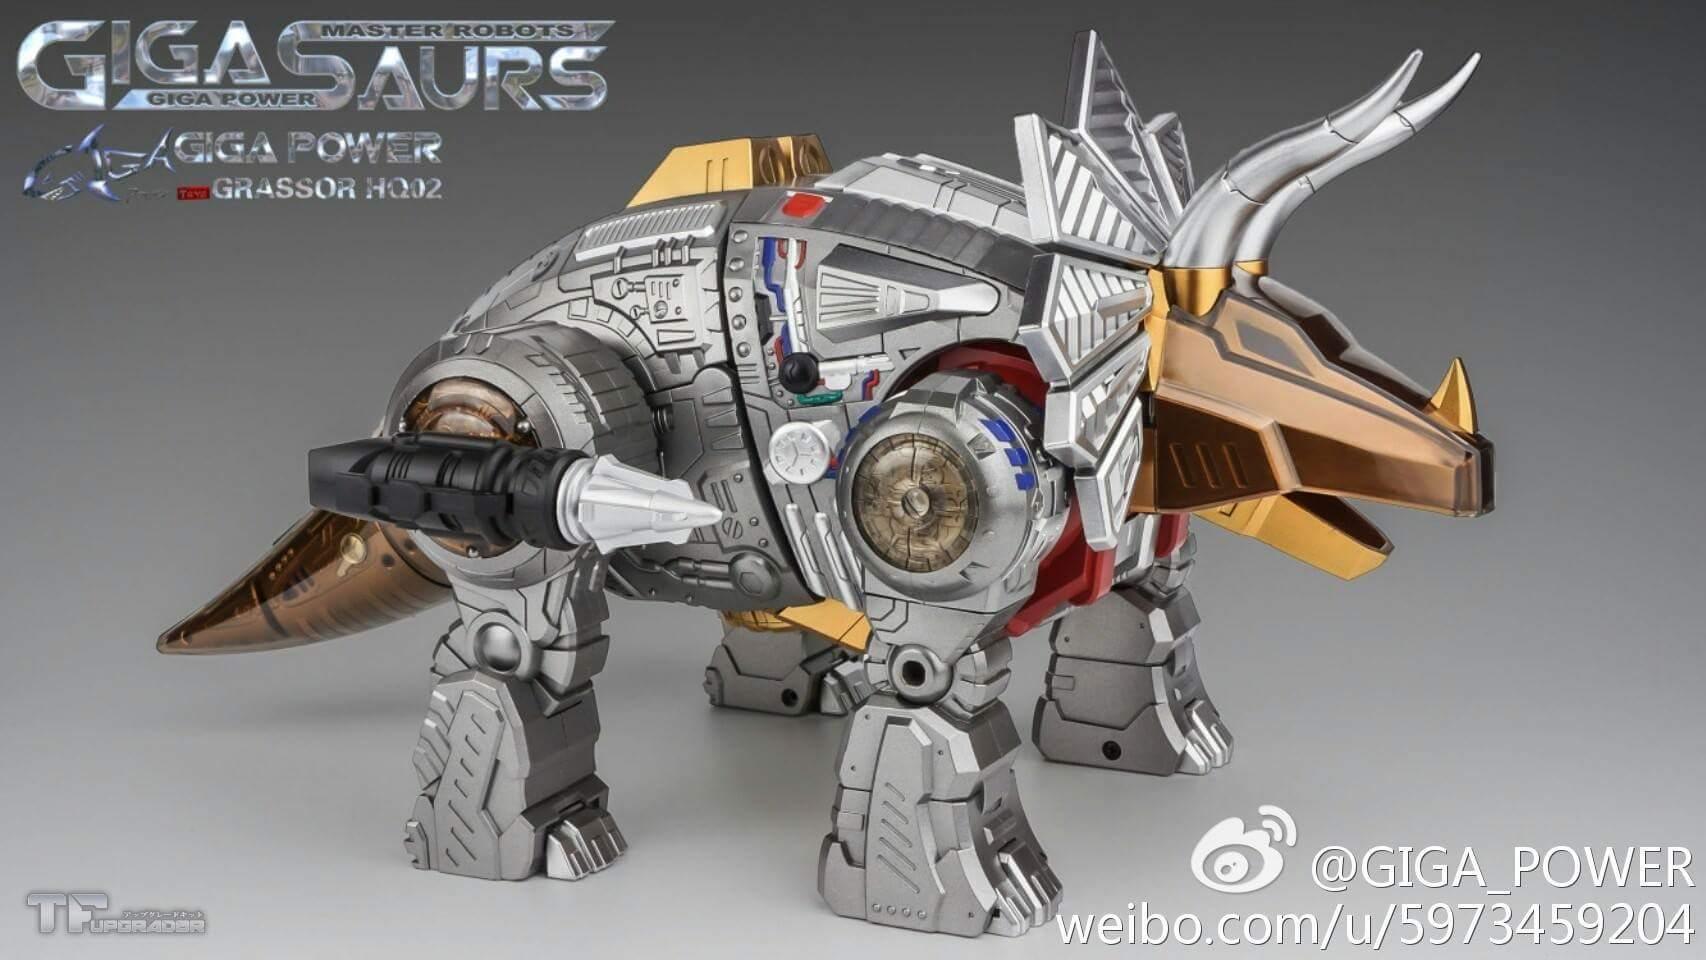 [GigaPower] Produit Tiers - Jouets HQ-01 Superator + HQ-02 Grassor + HQ-03 Guttur + HQ-04 Graviter + HQ-05 Gaudenter - aka Dinobots - Page 5 Z4cafzFX